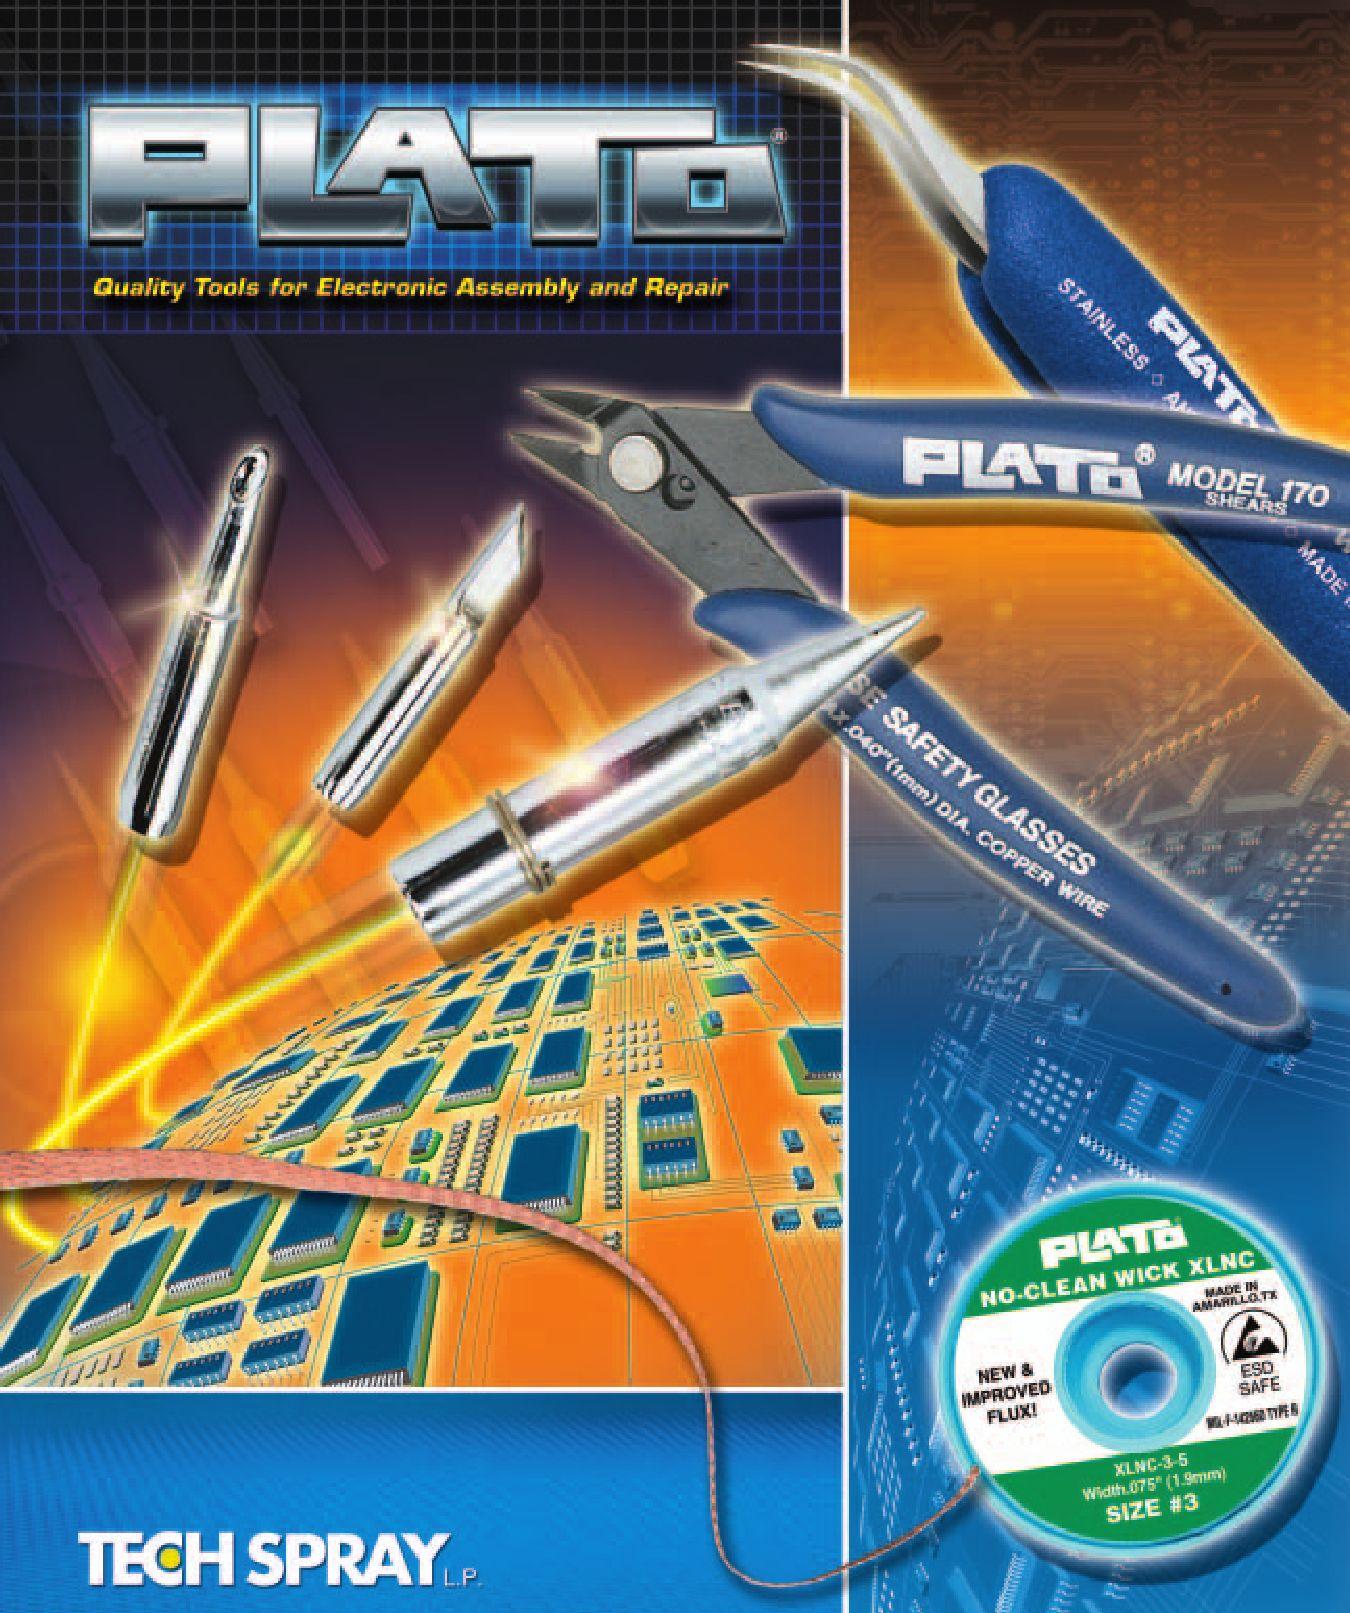 PLATO 33-6057 Soldering Tip